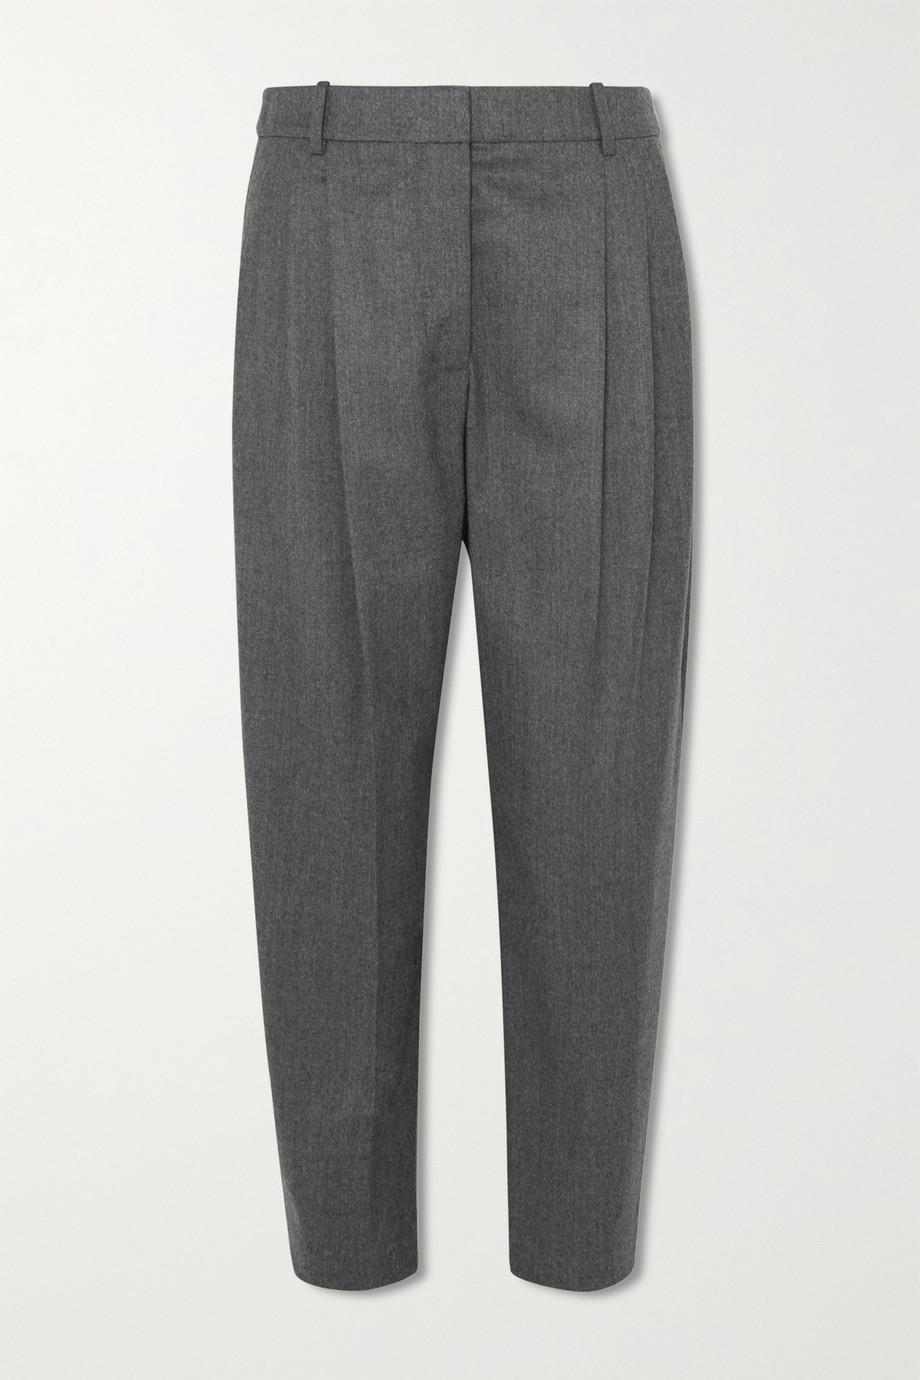 Stella McCartney Pantalon fuselé raccourci en laine à plis pressés